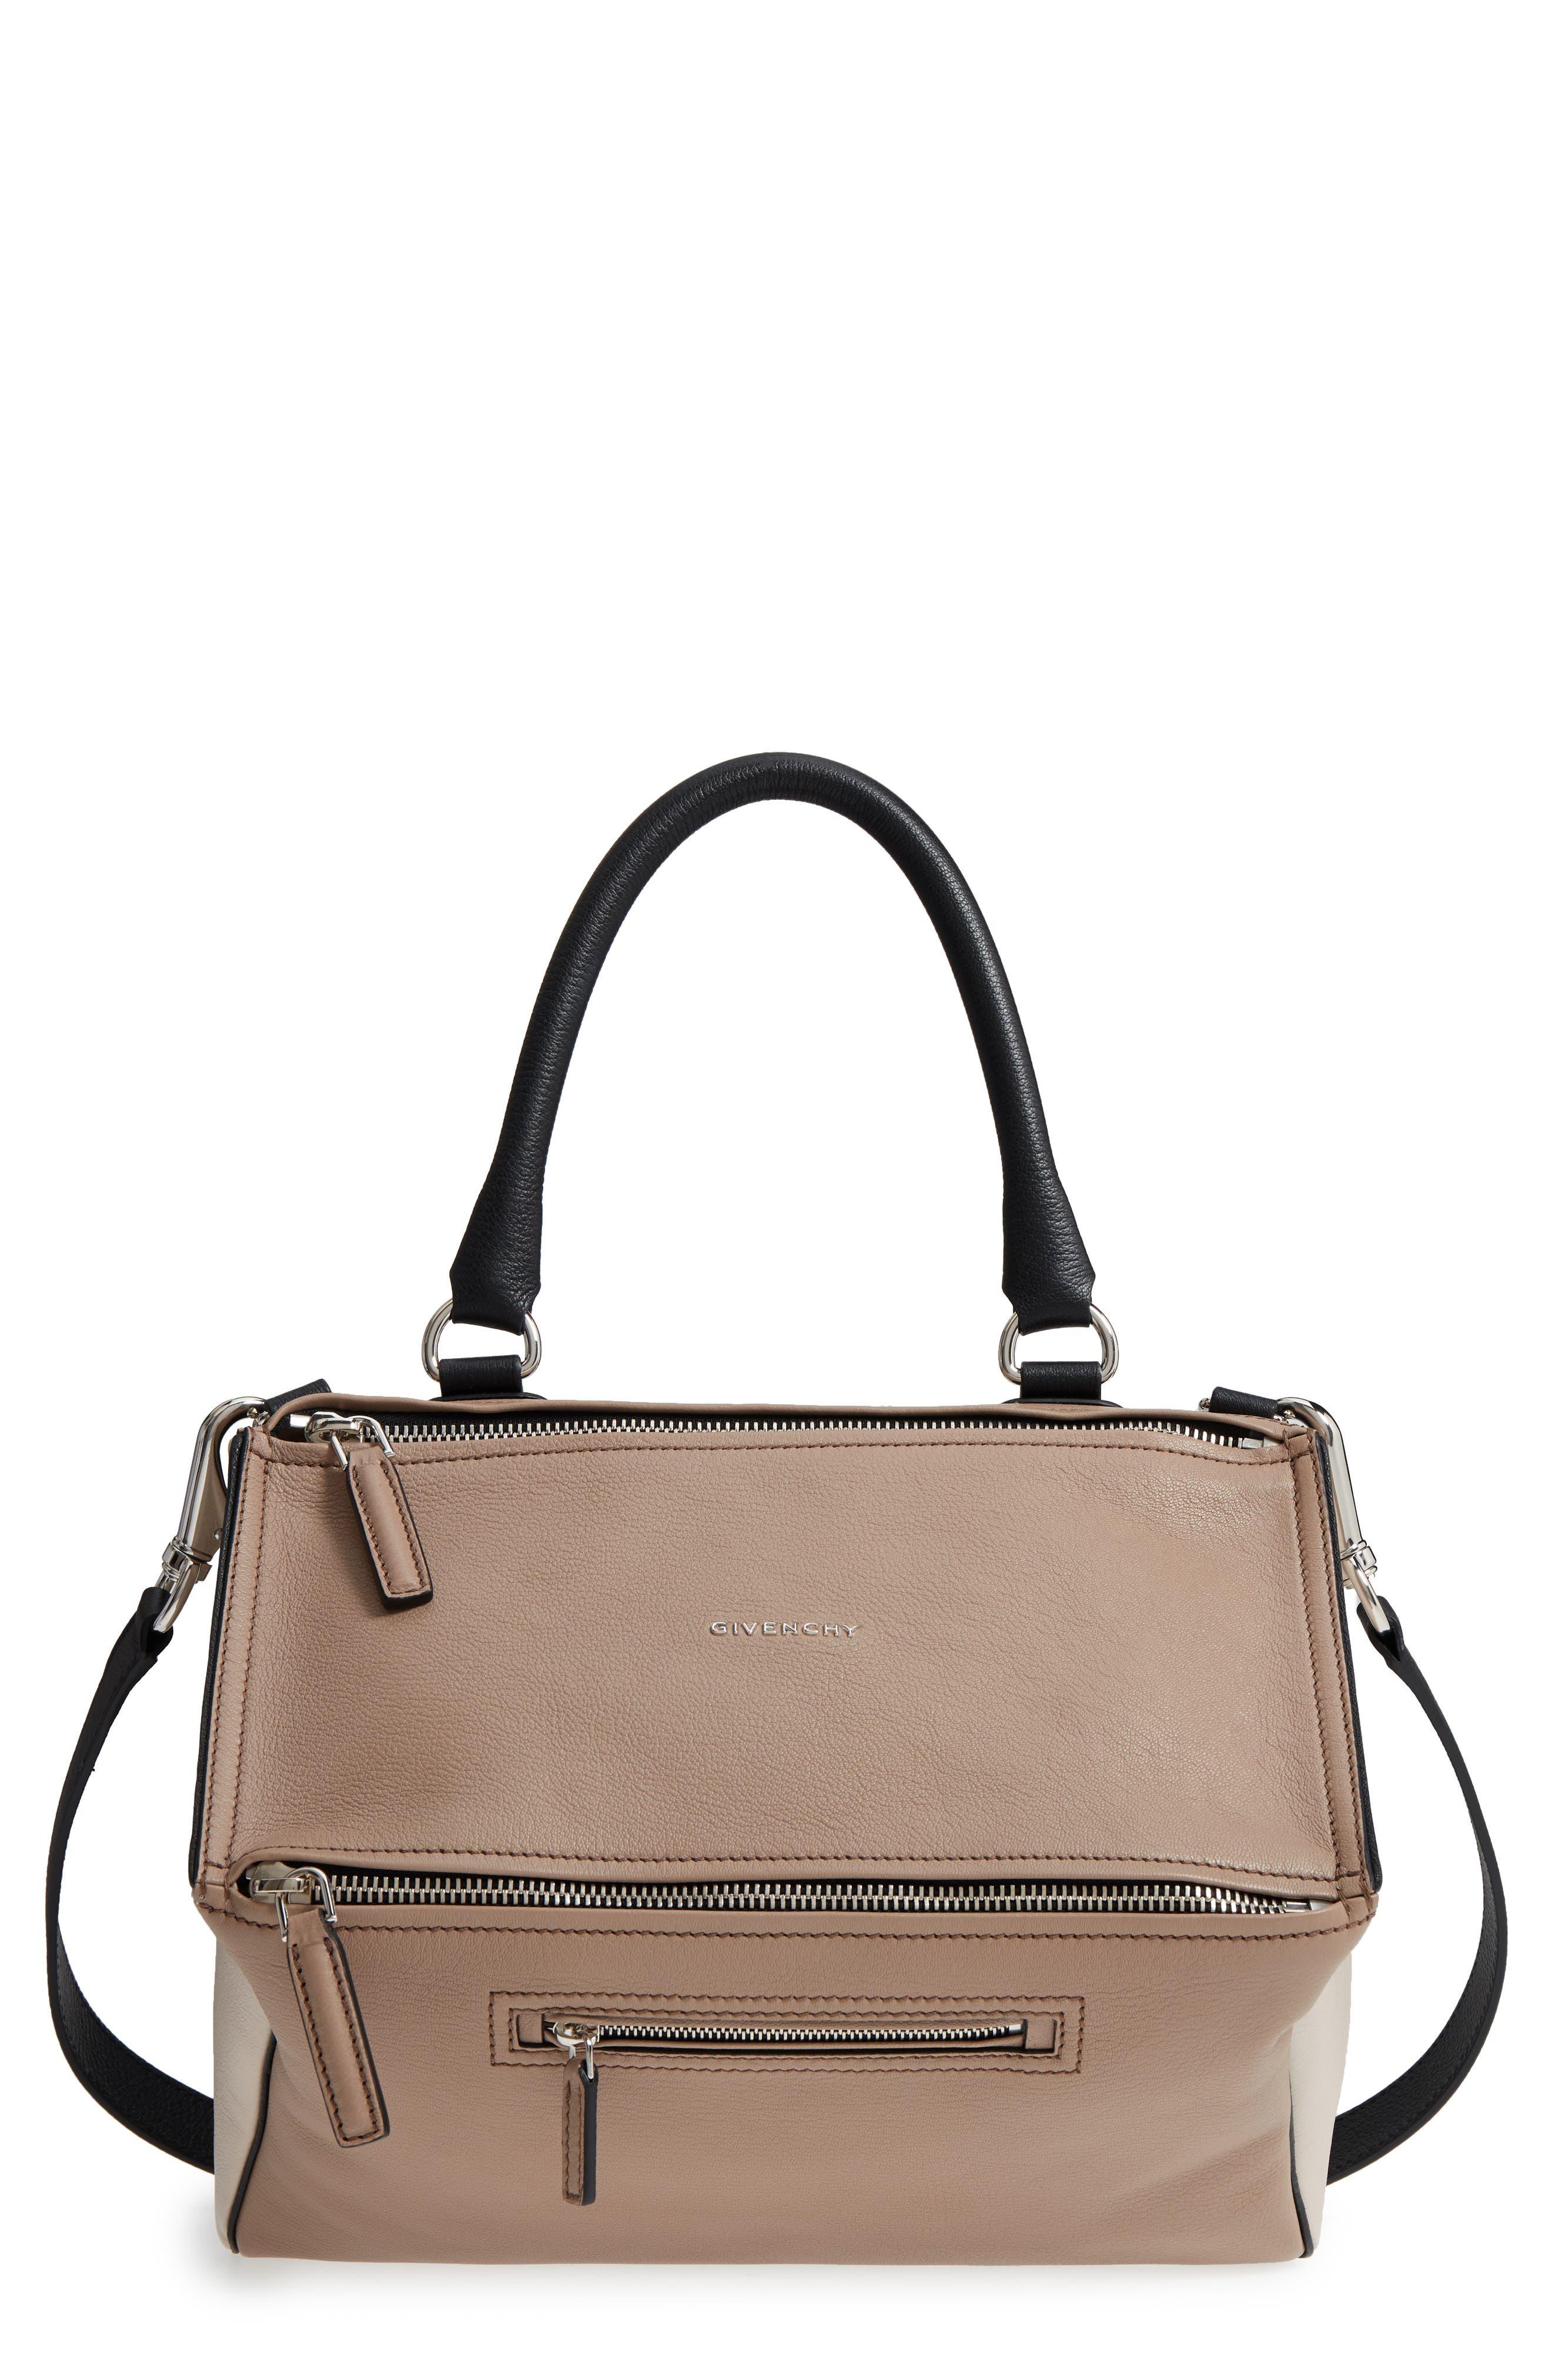 Medium Pandora Box Tricolor Leather Crossbody Bag,                             Main thumbnail 1, color,                             250